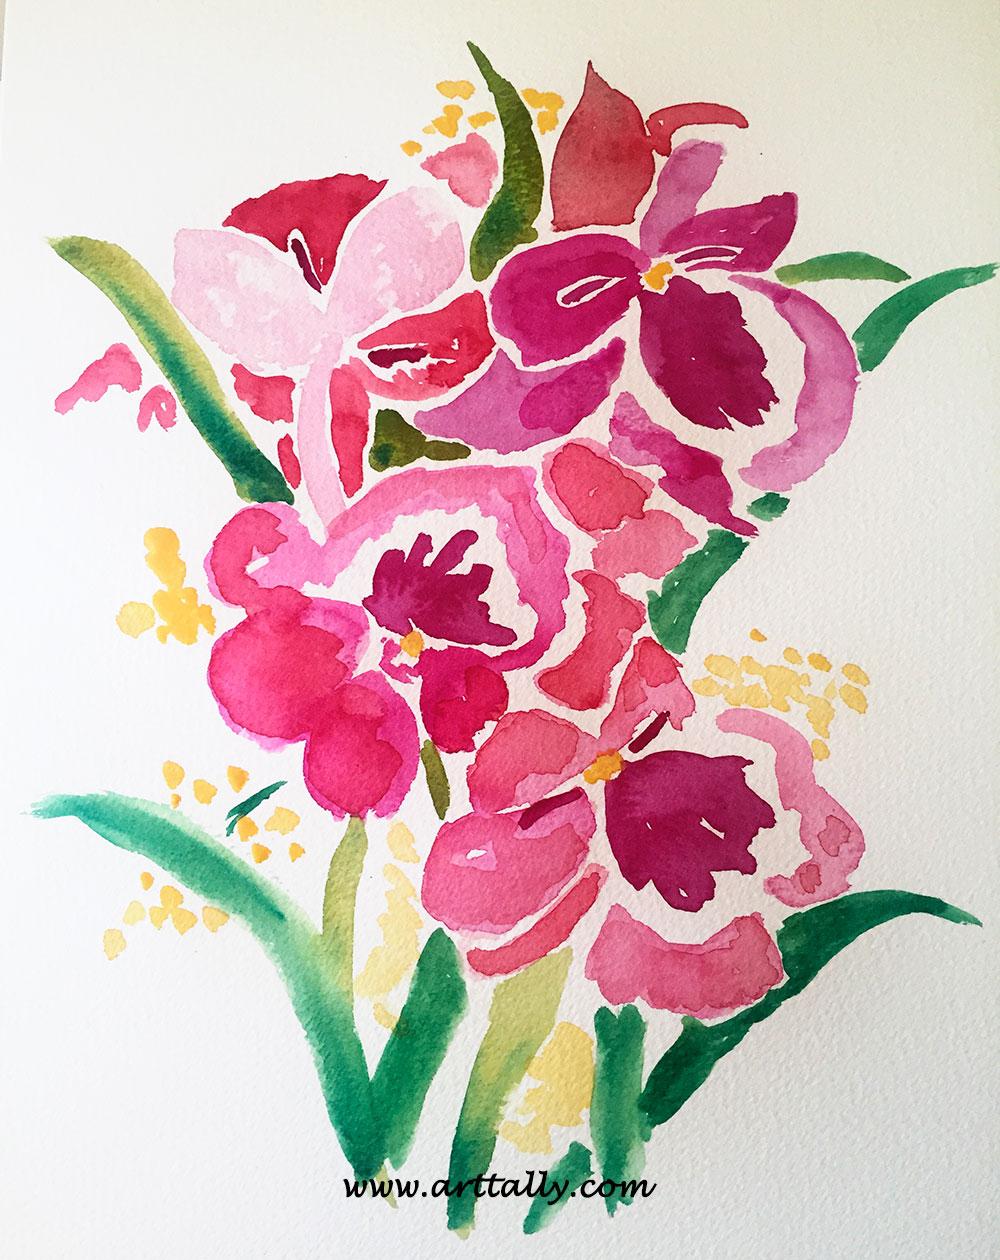 30-minute-flowers-no-1-w_arttally